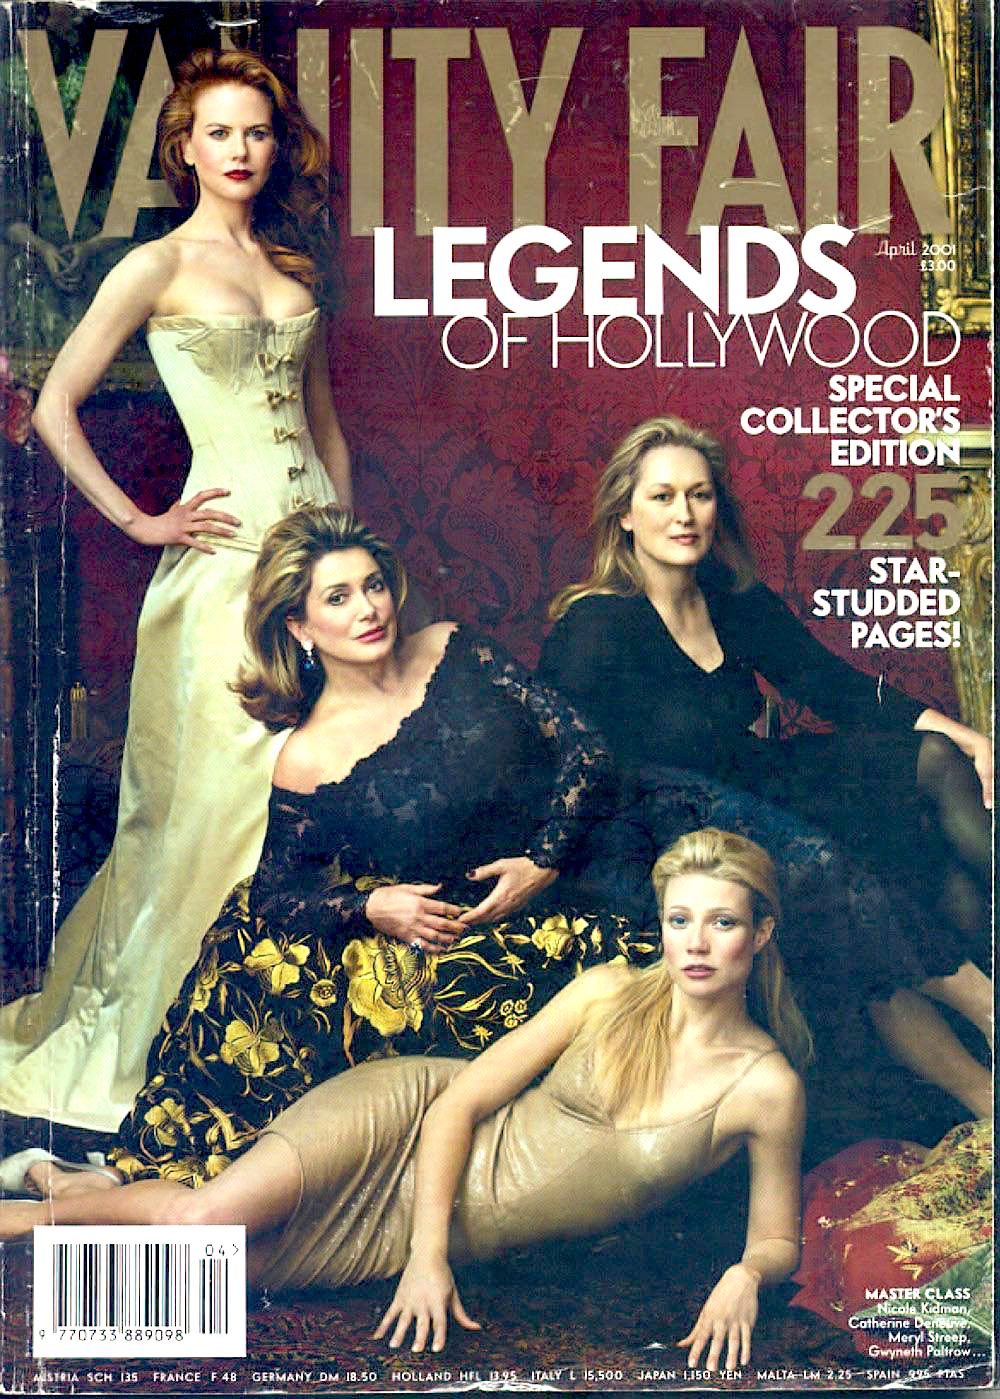 Top 10 Nicole Kidman Vanity Fair Covers Blog The Film Experience